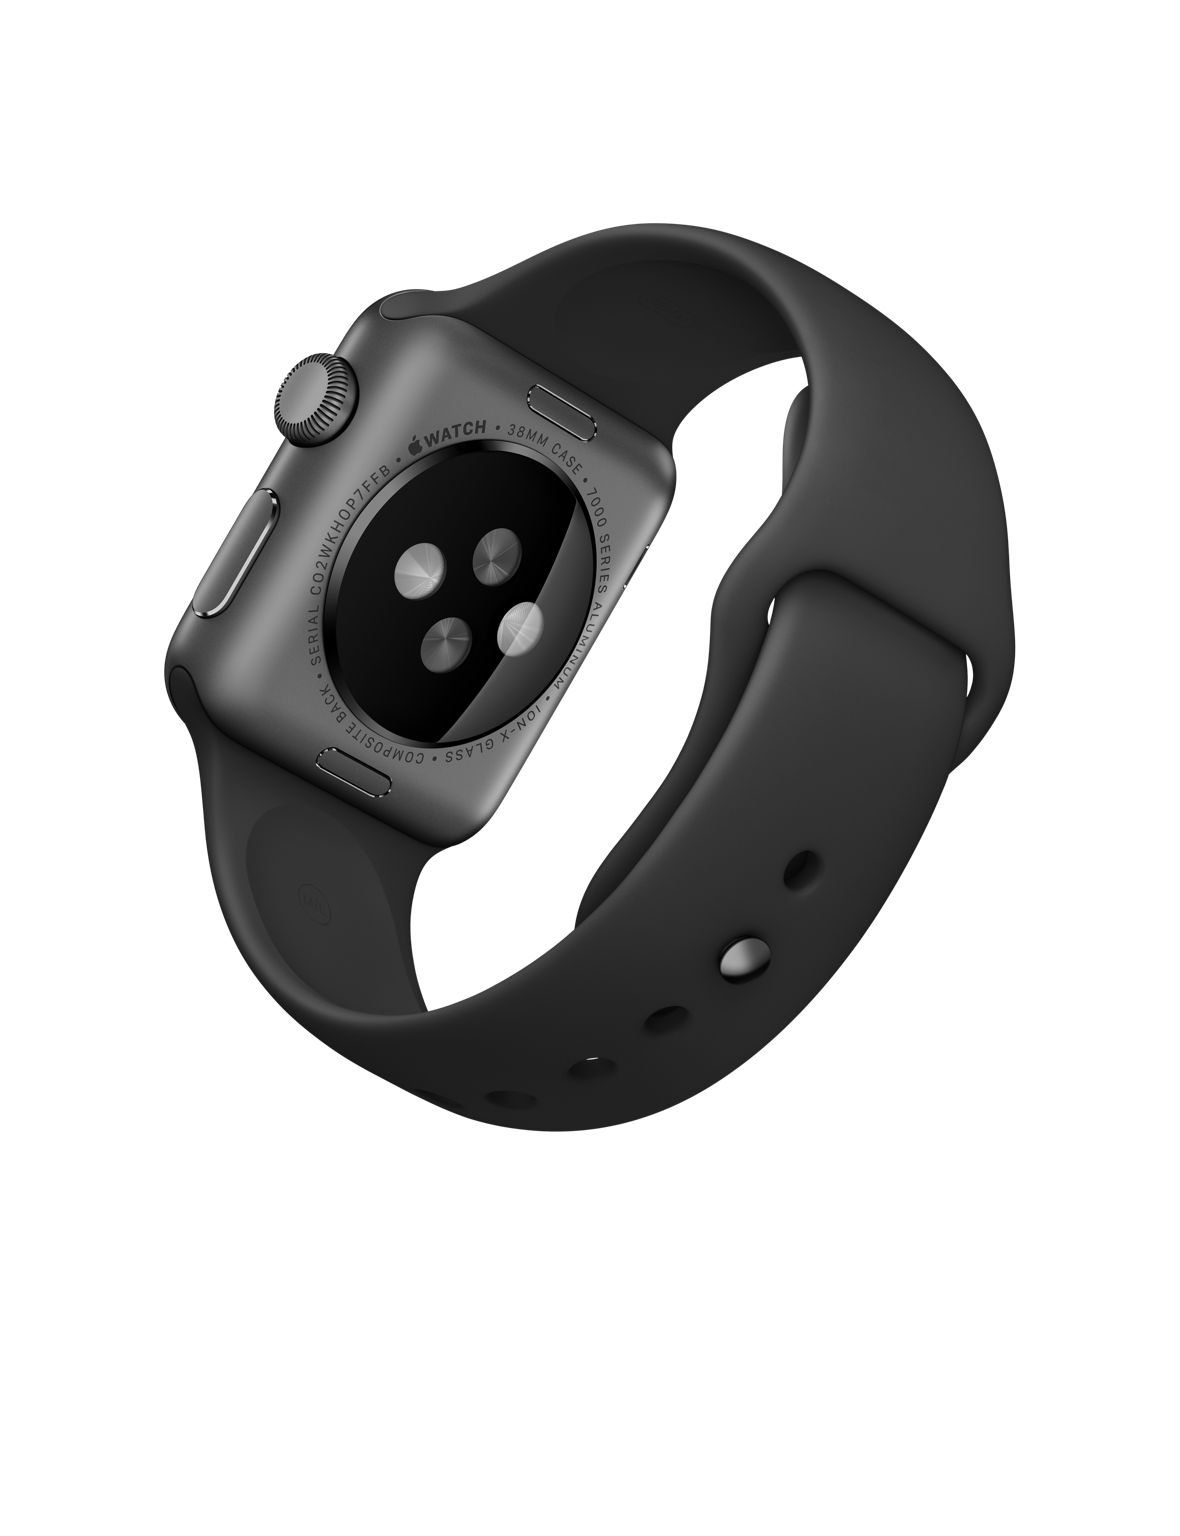 Apple Watch Sport 42mm Space Gray with Black Sport Band (MJ3T2), Эппл Вотч Спорт 42мм Темно серые с спортивным ремешком (MJ3T2)